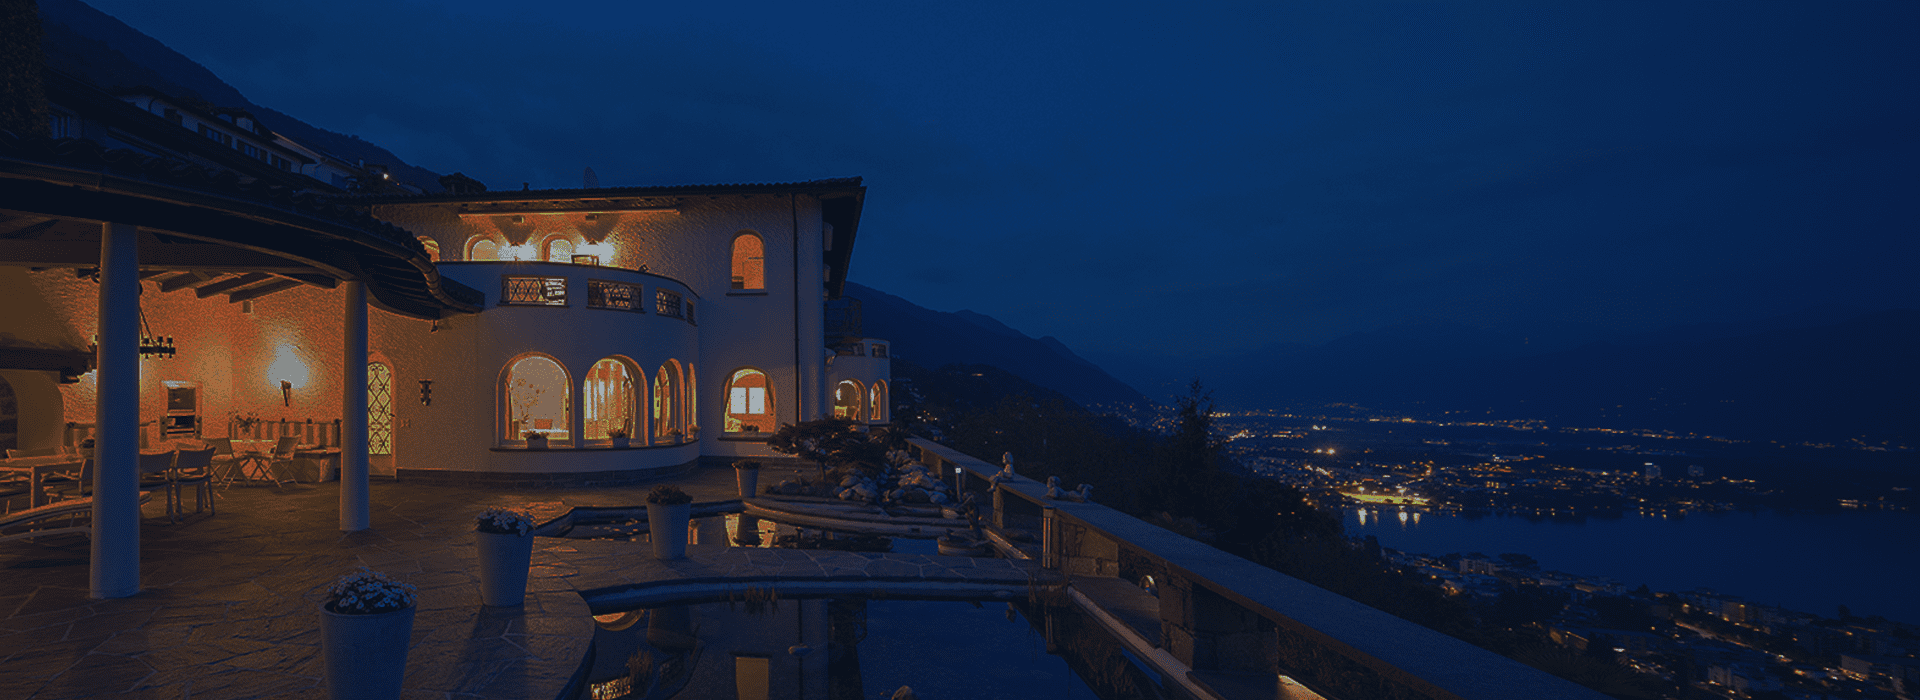 Luxury-Home-at-Night-6